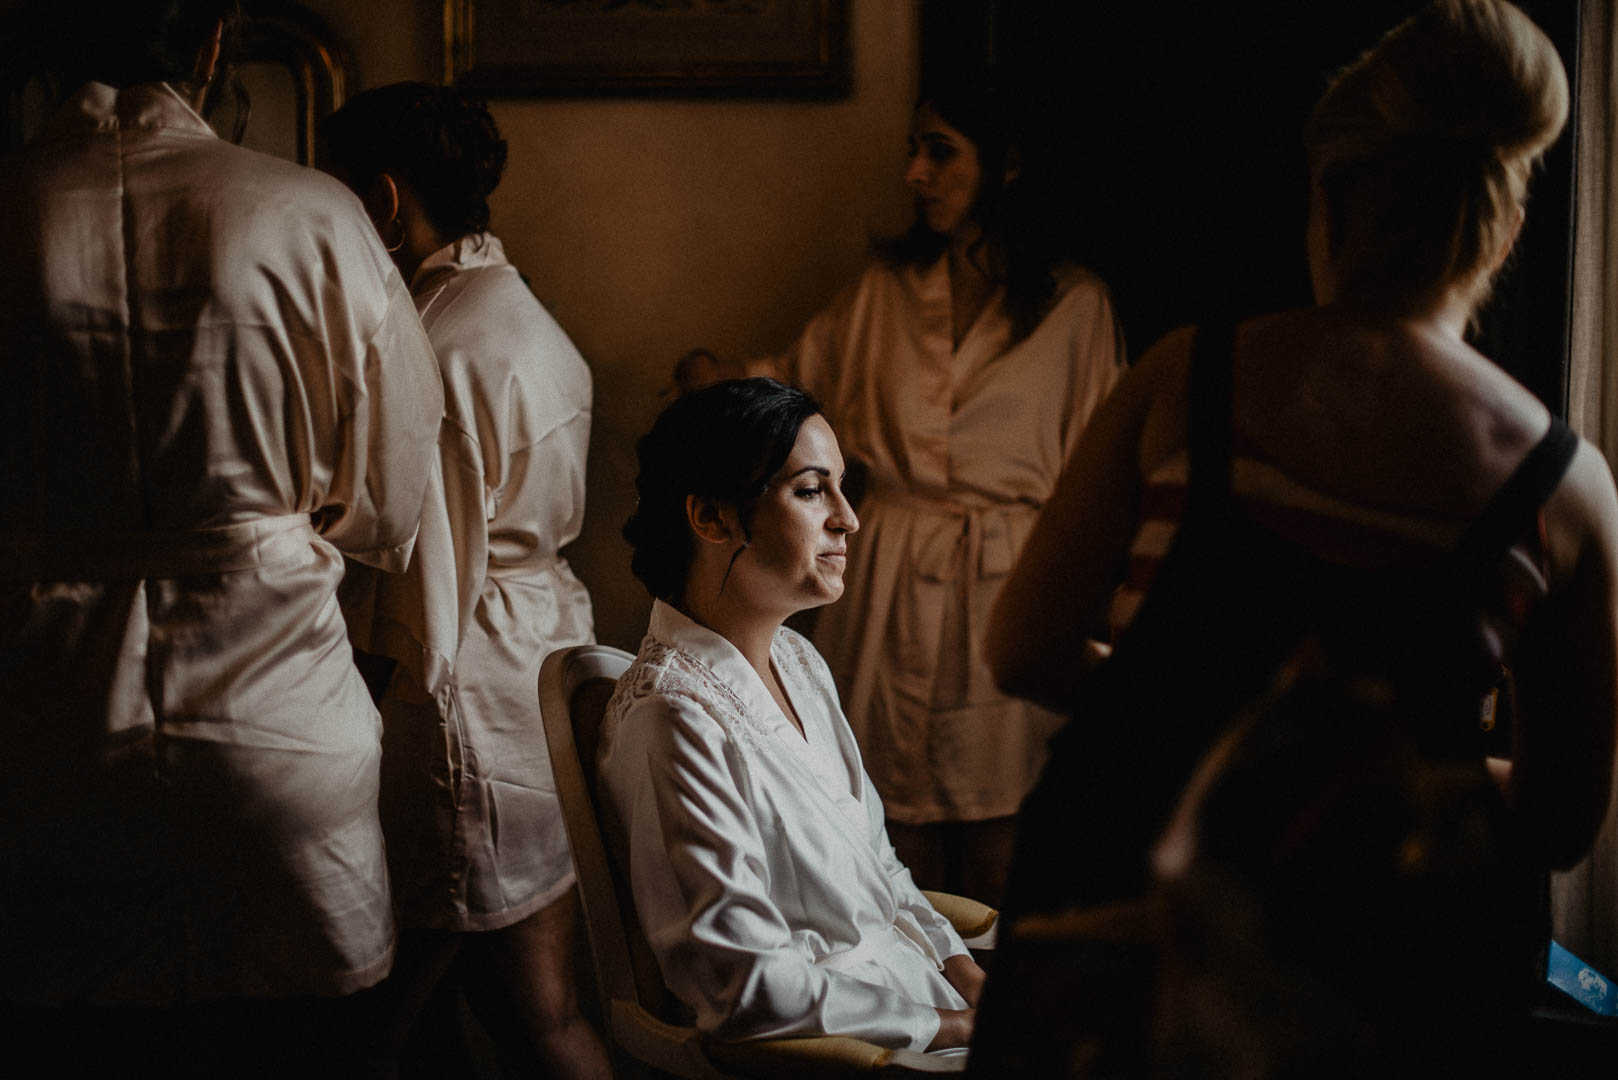 wedding-photographer-destination-fineart-bespoke-reportage-tuscany-villascorzi-vivianeizzo-spazio46-31